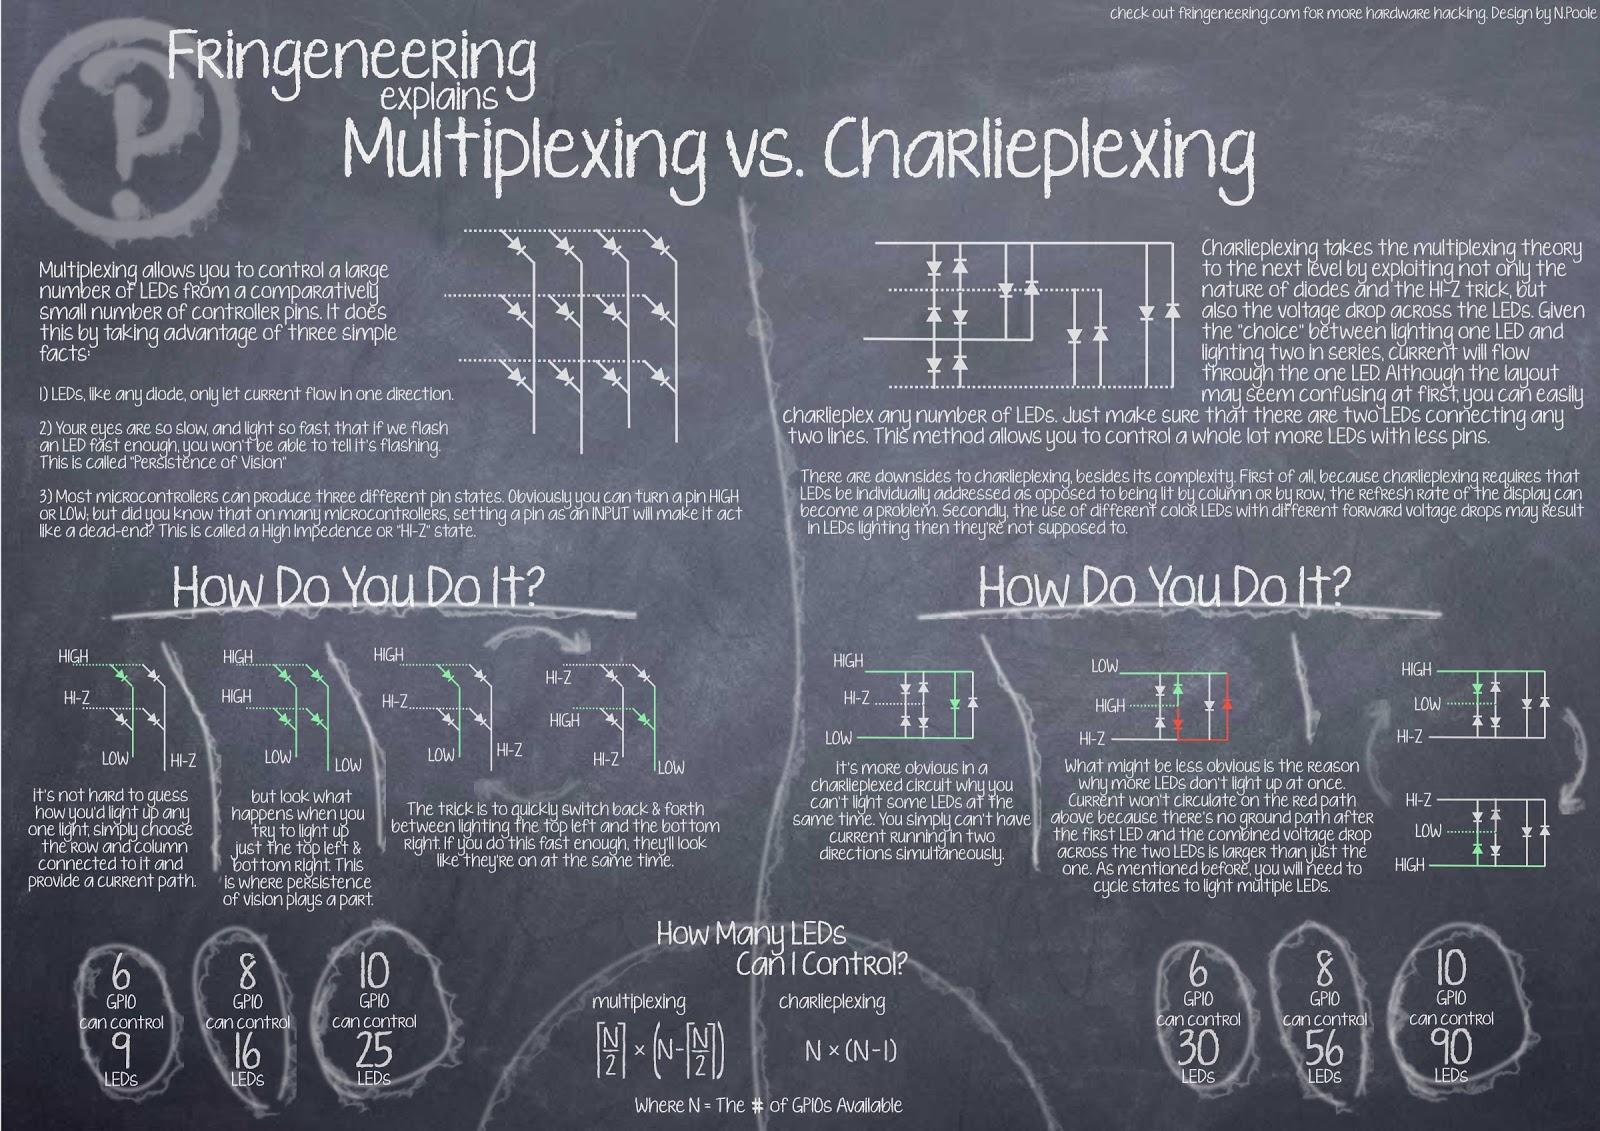 Charlieplexing